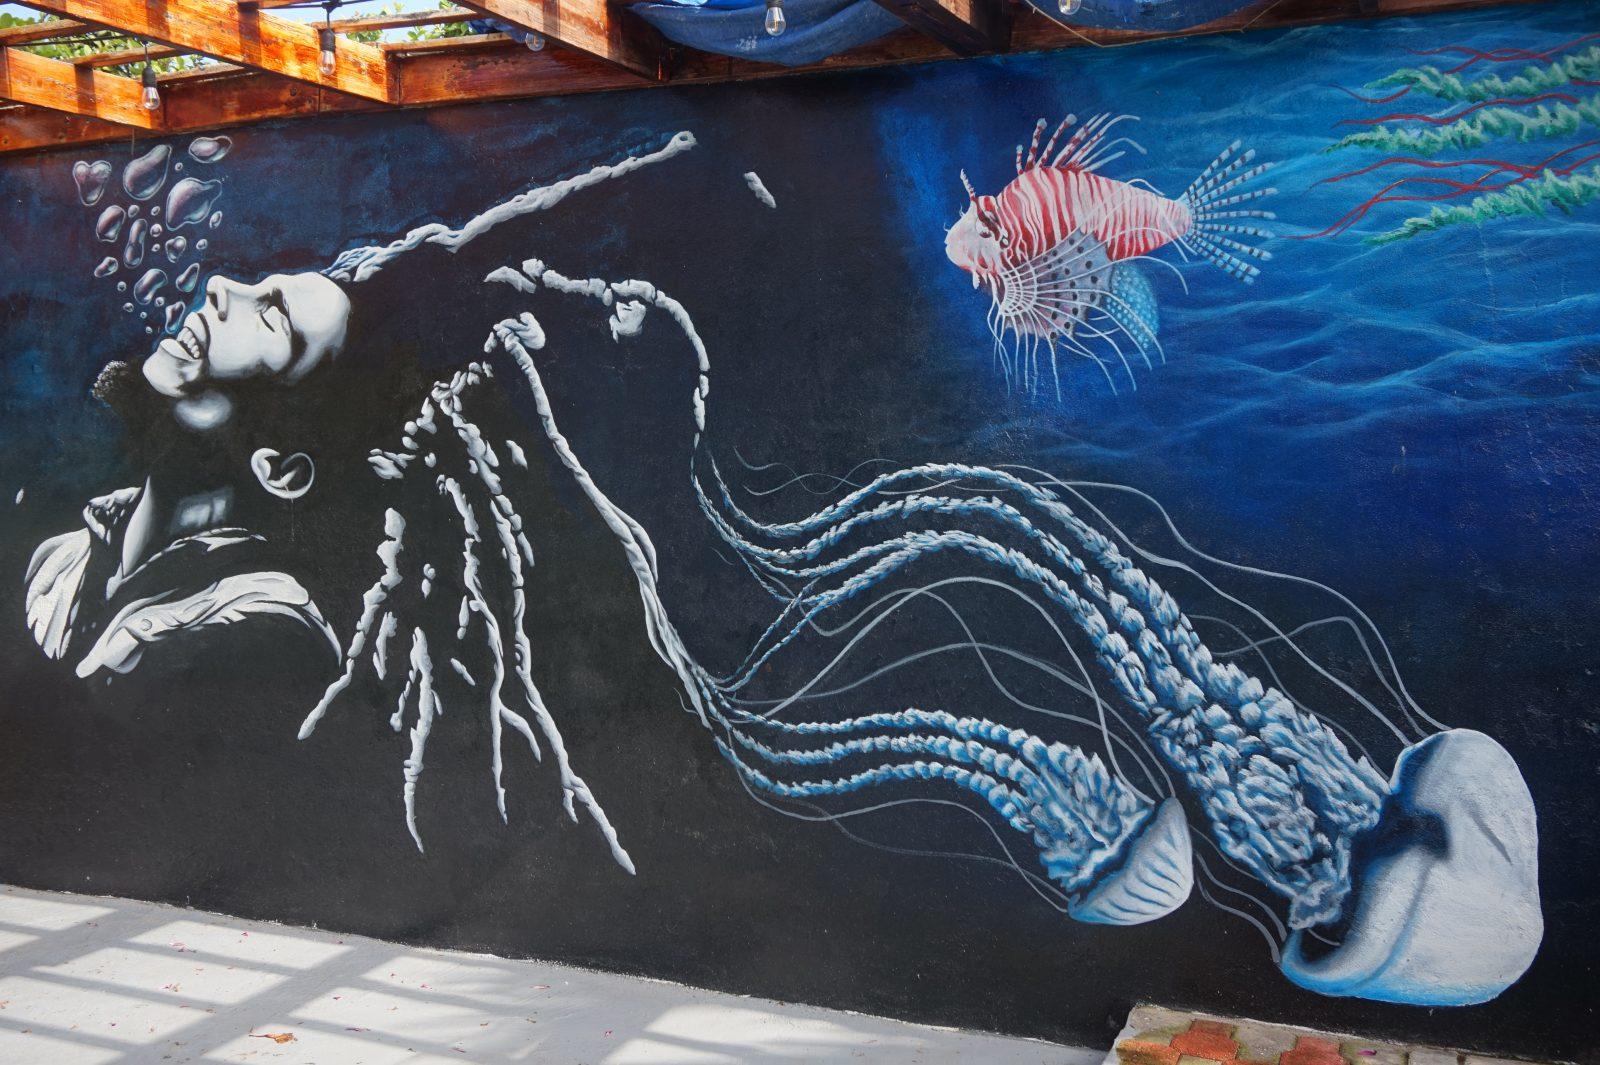 The Bob Marley mural focusing on the underwater scene